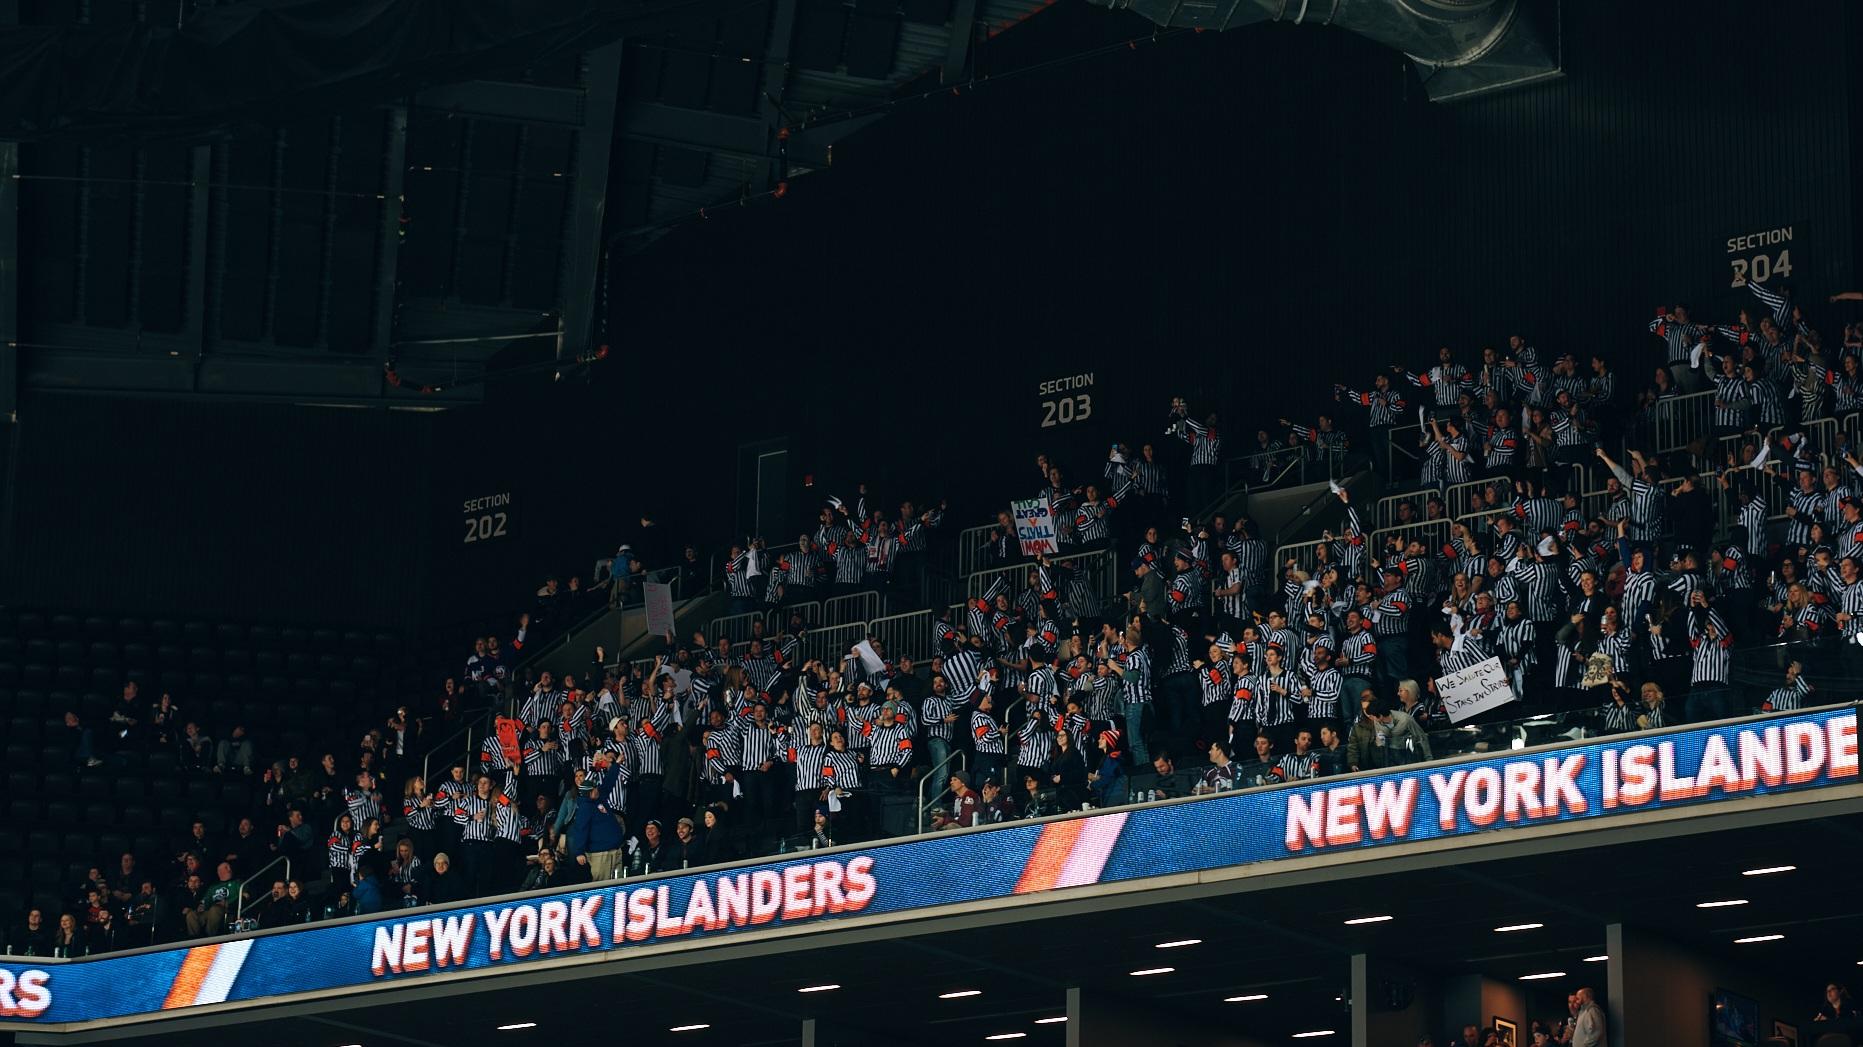 NYC_jan19 91.jpg